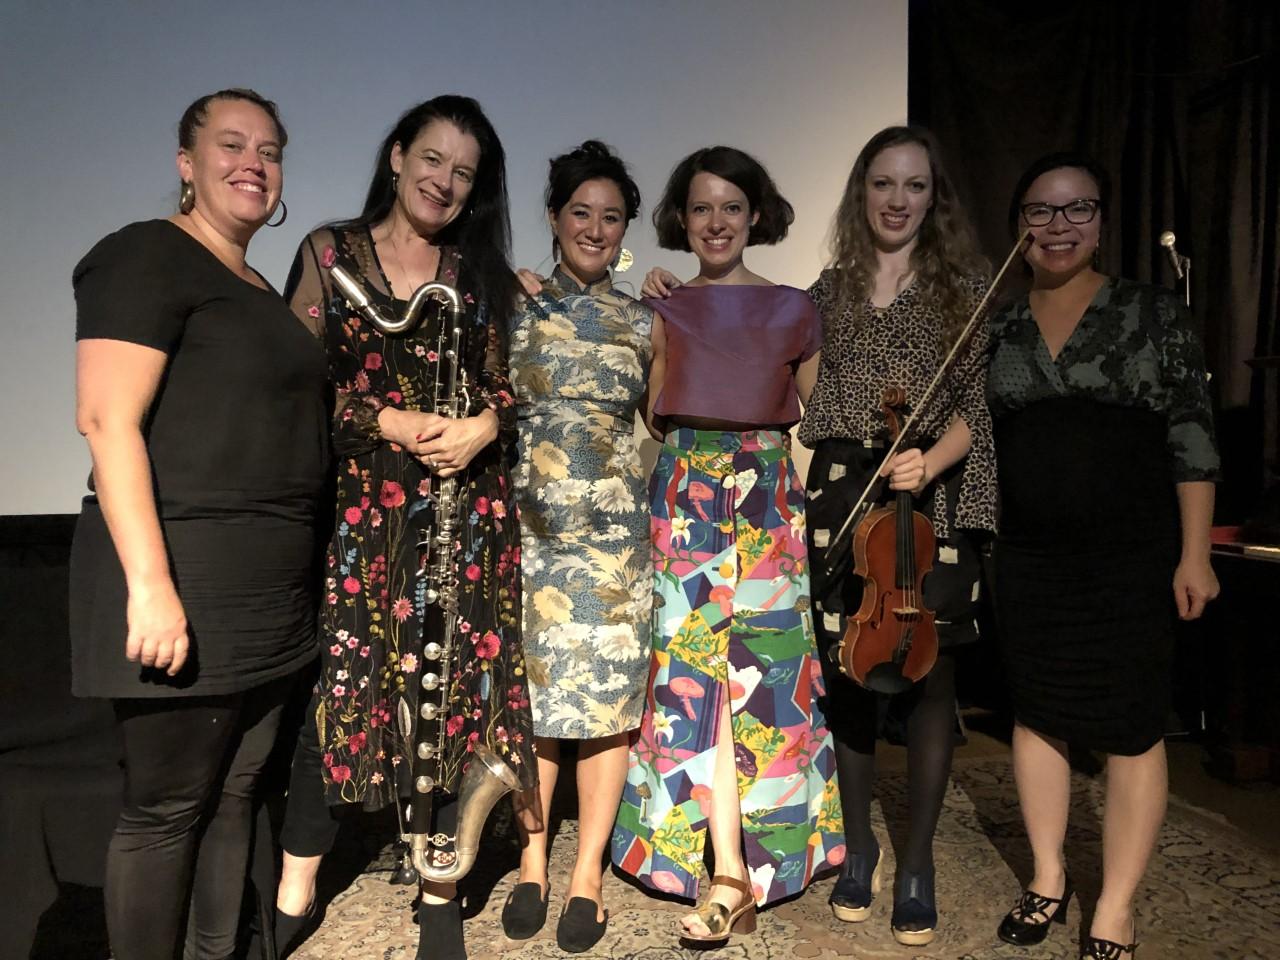 Gemma Horbury, Brigid Burke, Teresa Duddy, Alexandra Mathew, Isabel Hede, Kay Cai (L-R)